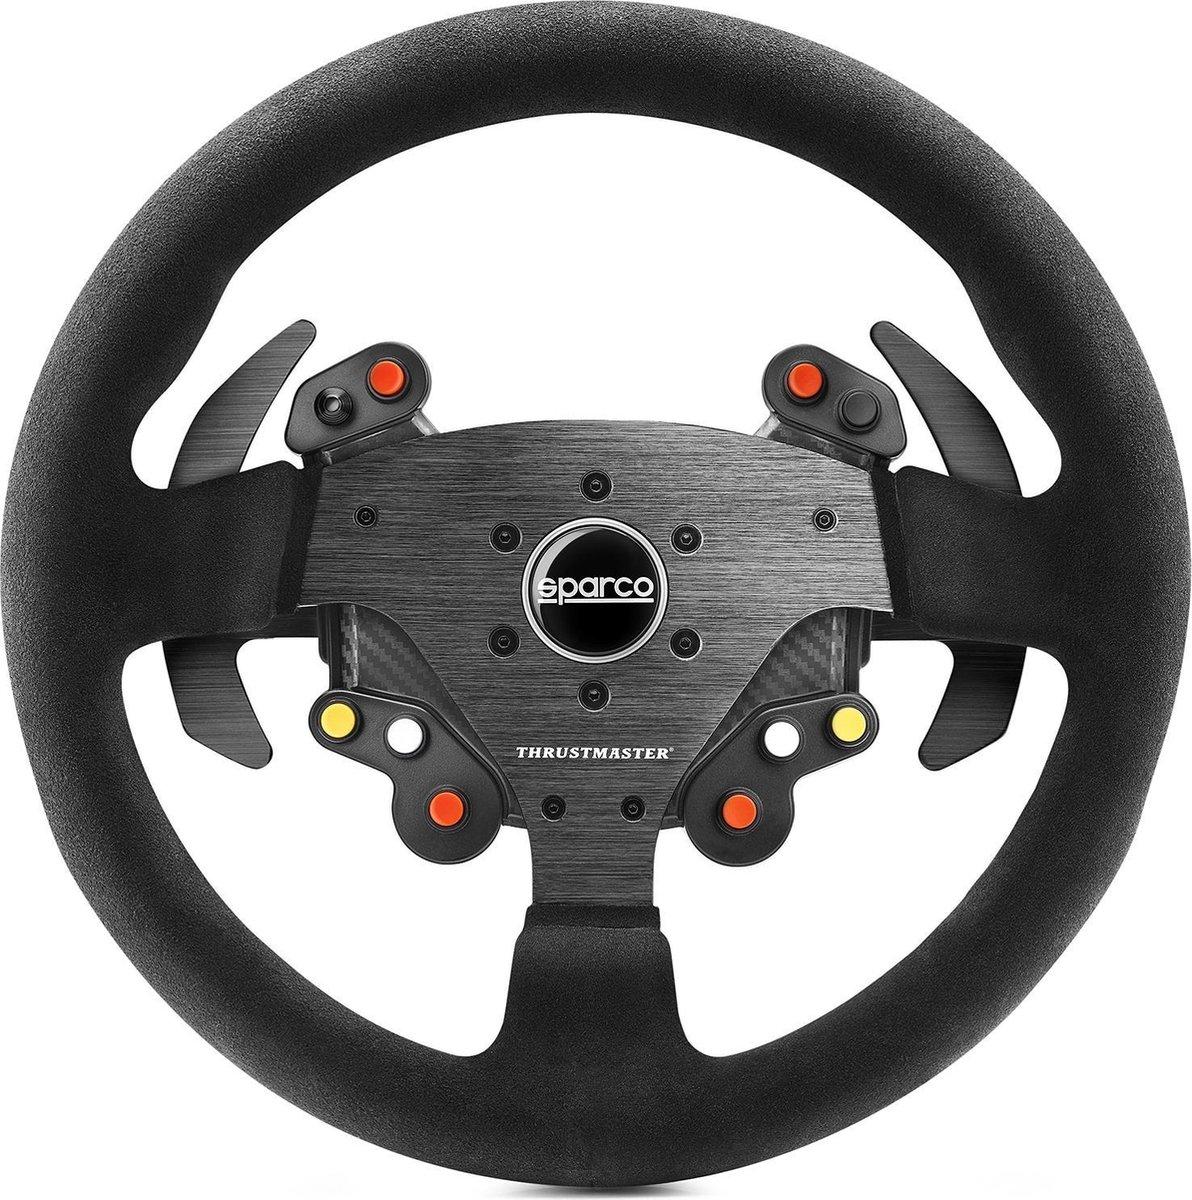 Thrustmaster Rally Wheel Add-On Sparco  R383 Mod Stuur PC, PlayStation 4, Xbox One Koolstof